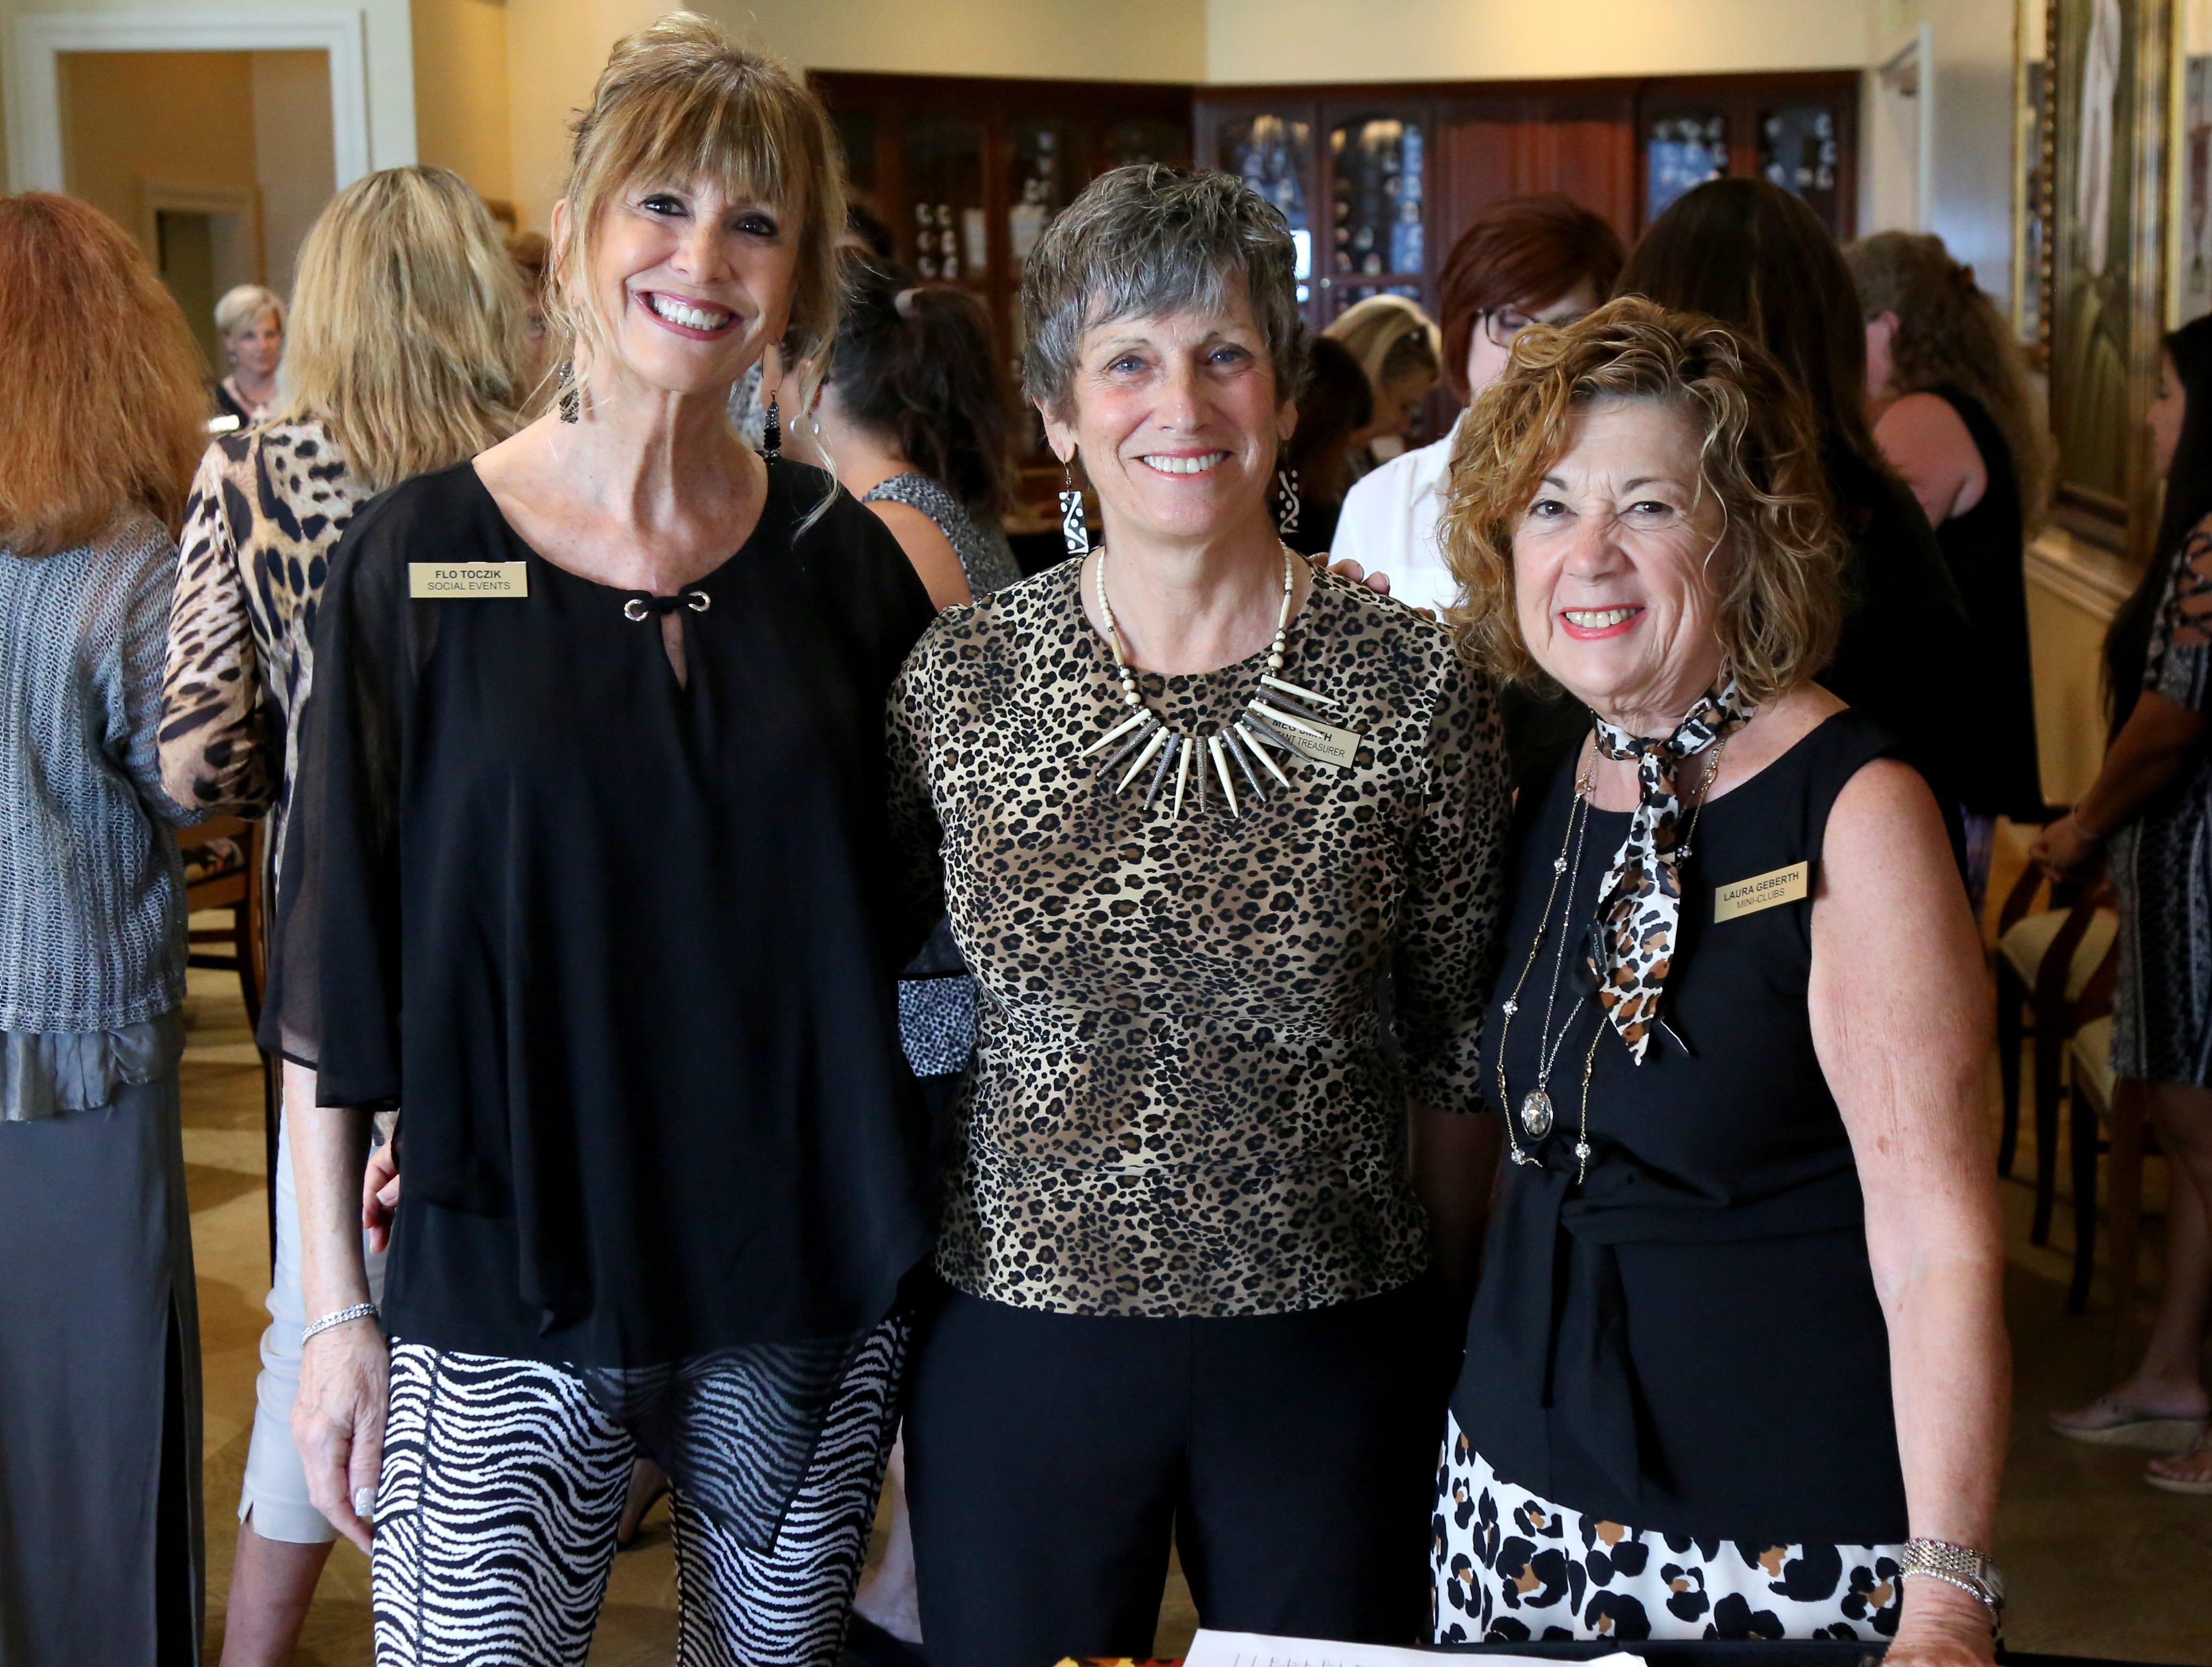 Flo Toczik, from left, Meg Smith, Laura Geberth.